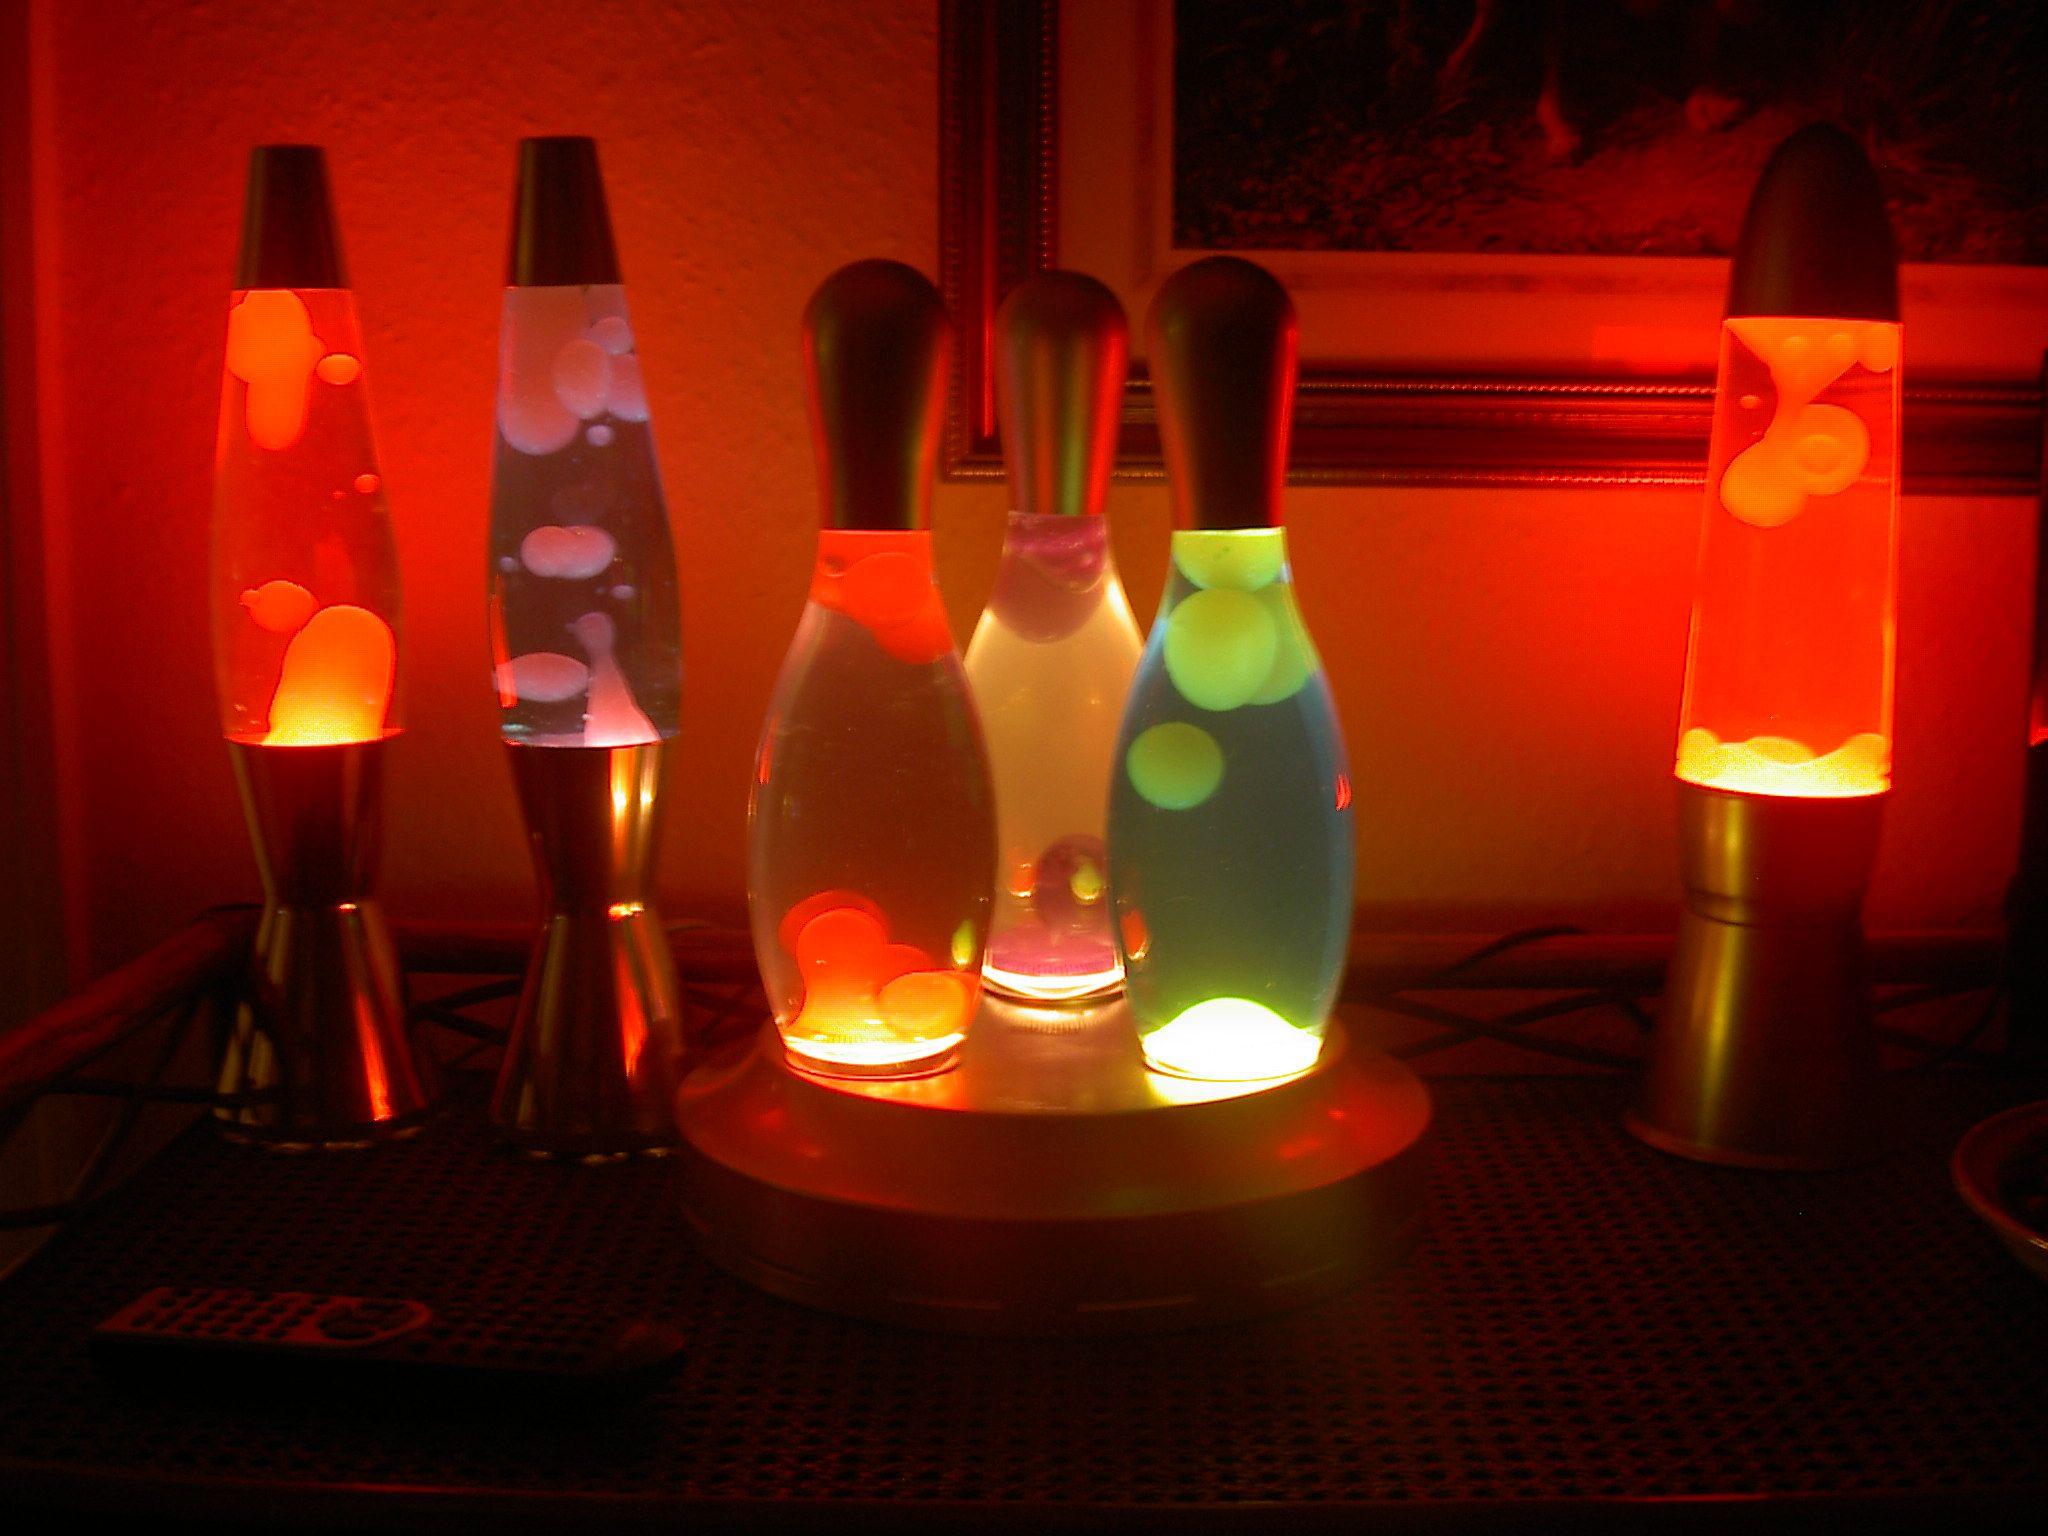 Lava lamp room - Cool Lava Lamps For Sale Skittles Lava Lamp Set For Sale Uk Seller Oozing